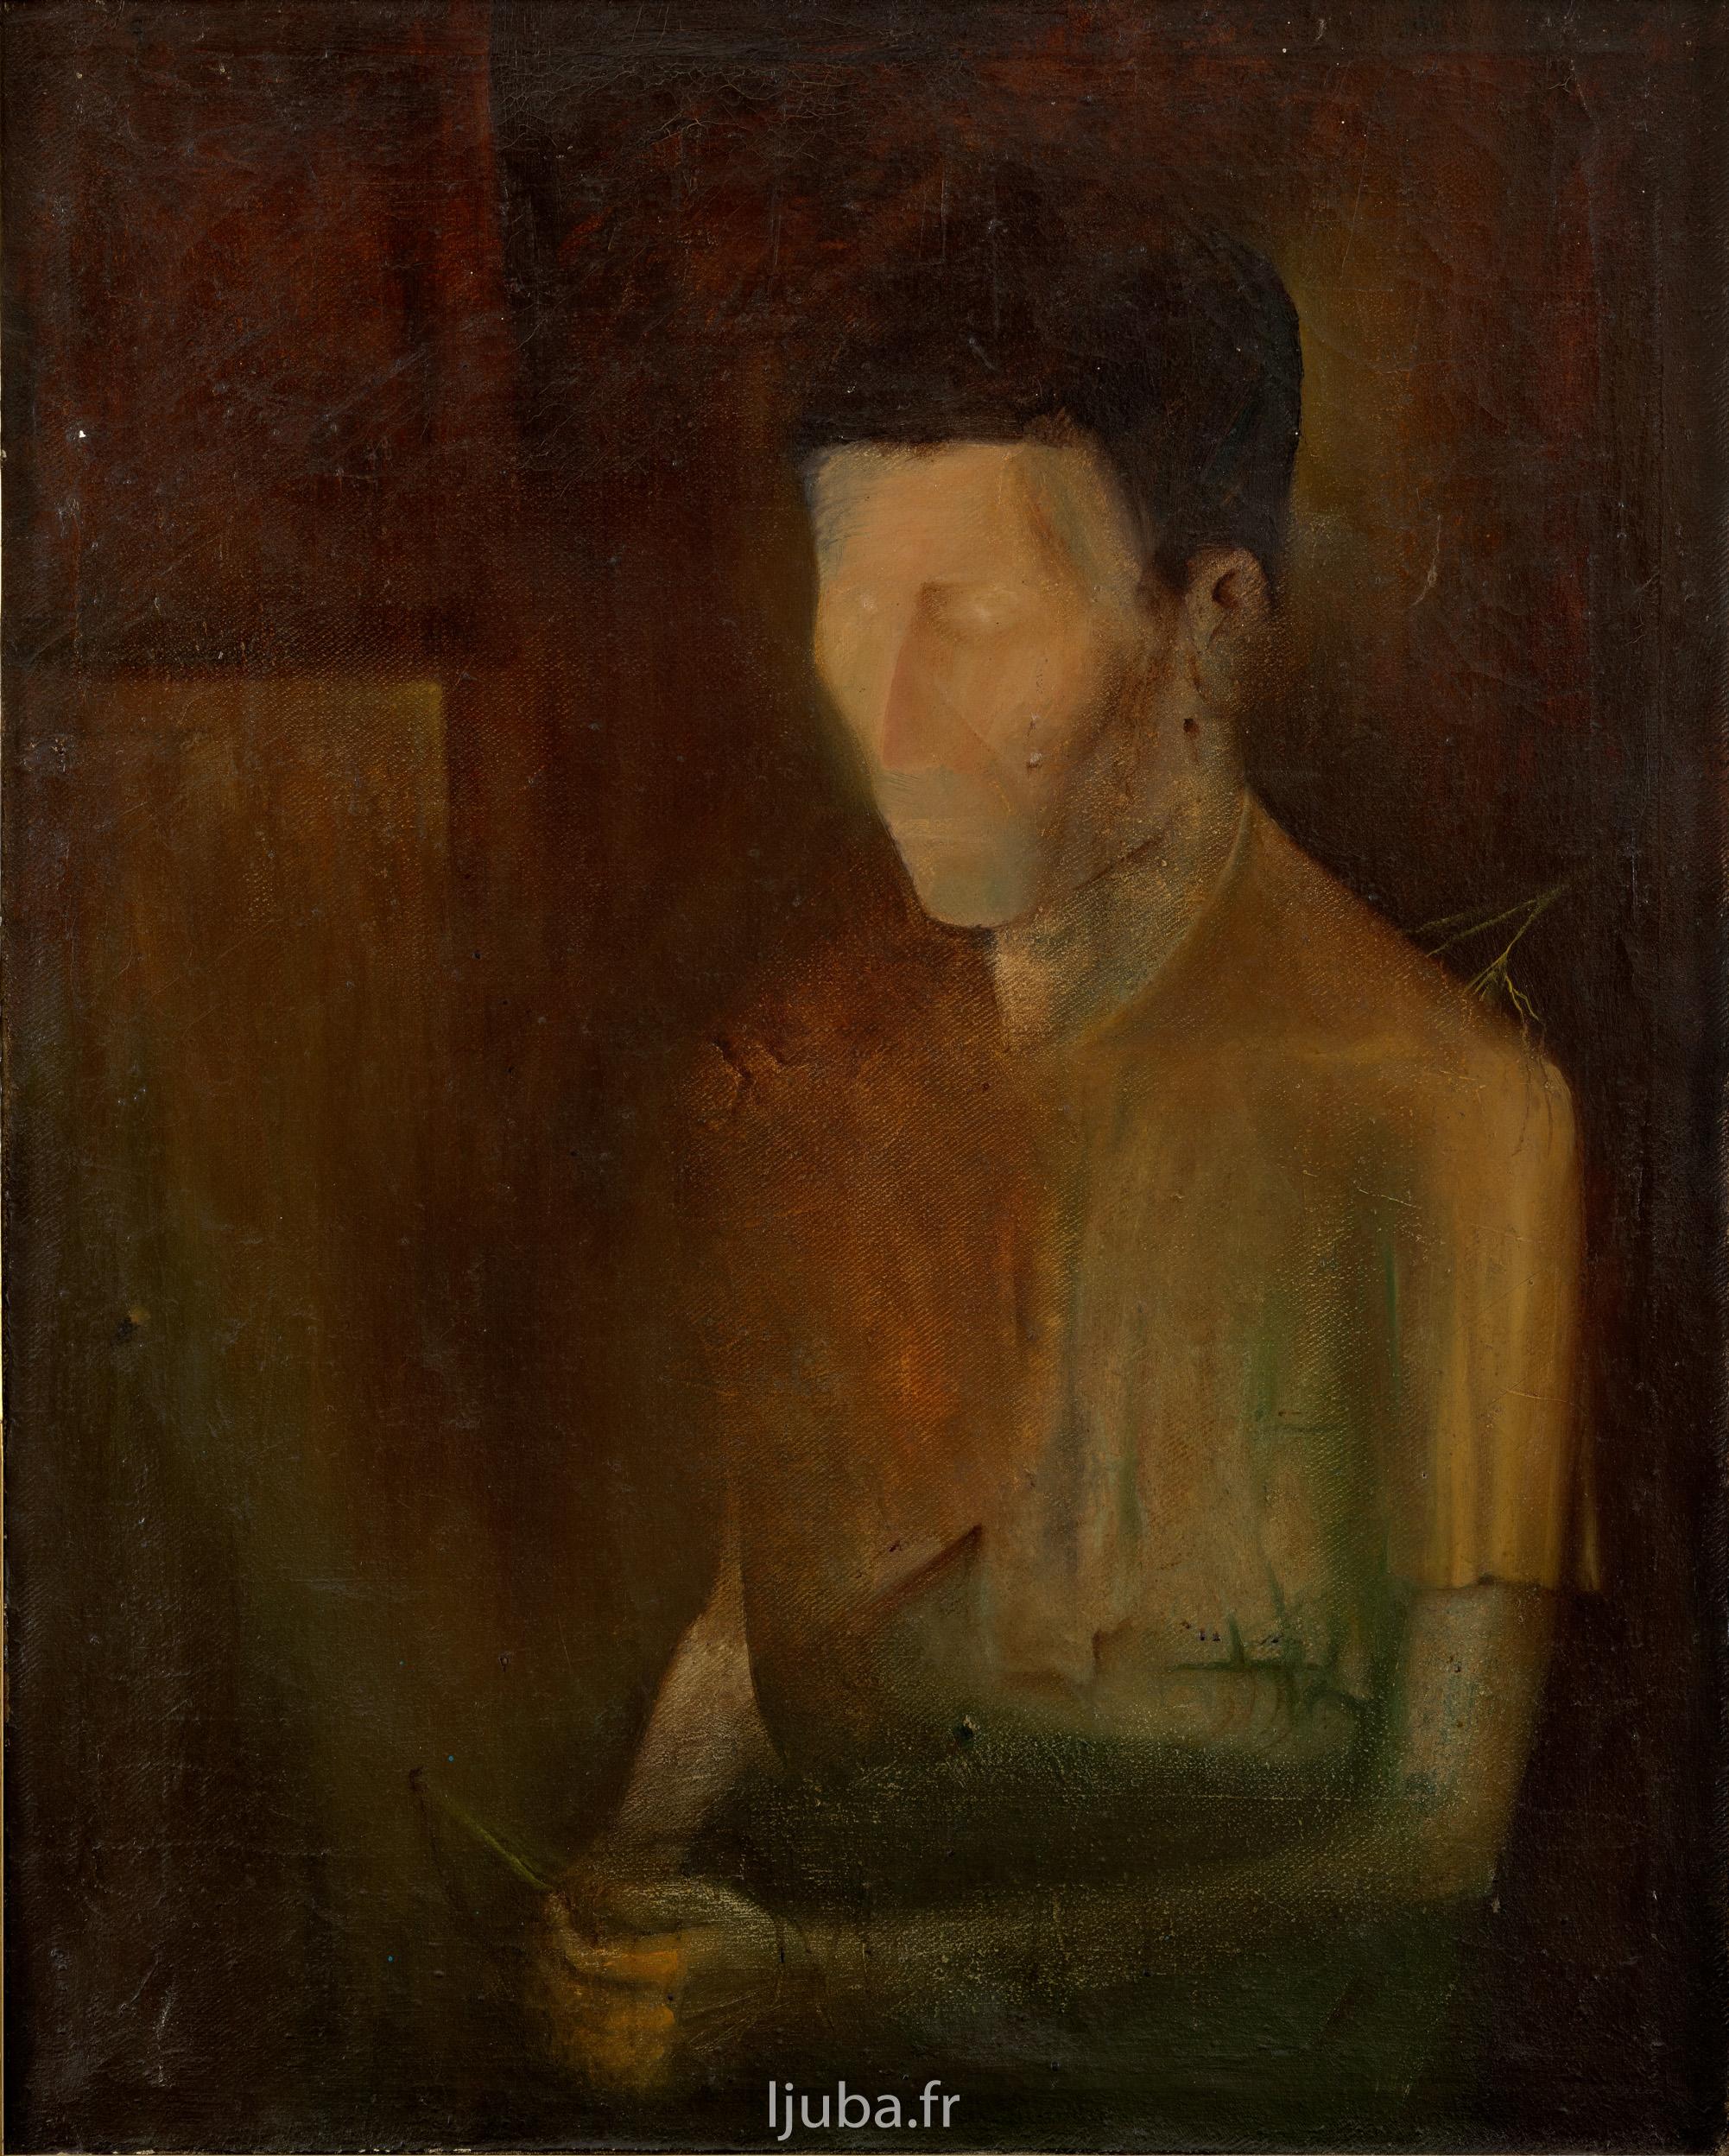 Ljuba Popovic - 1957, L'inconnu